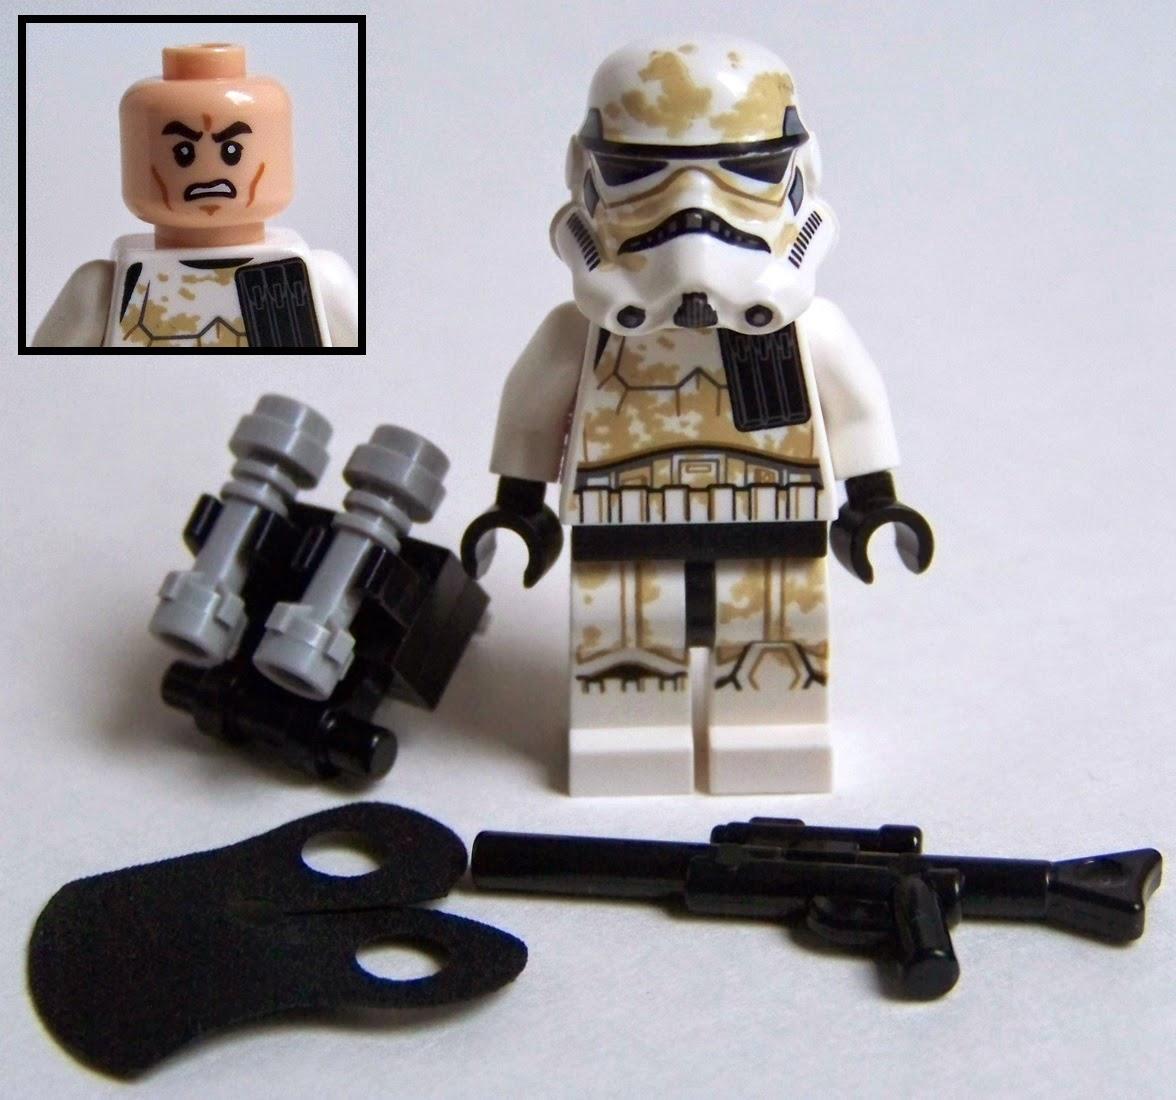 LEGO Mos Eisley Cantina 75052 Sandtrooper